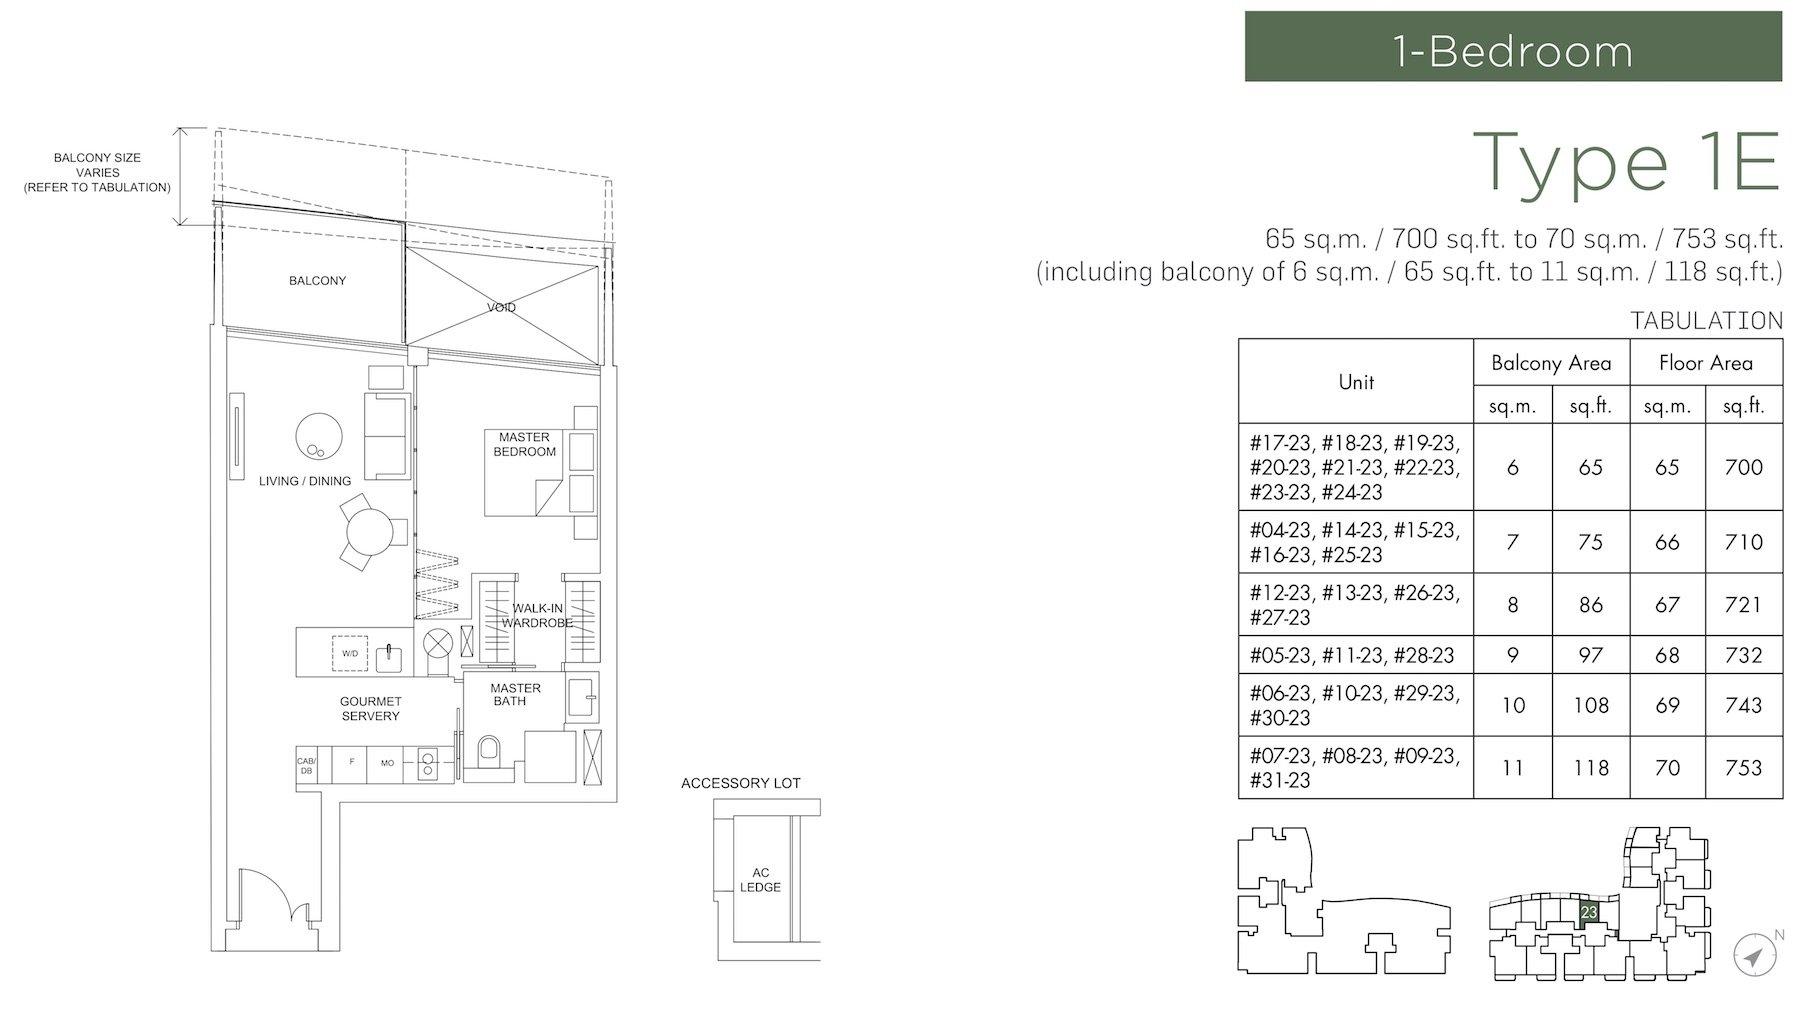 Marina One Residences 滨海盛景豪苑 floor plans 1 bedroom 1C